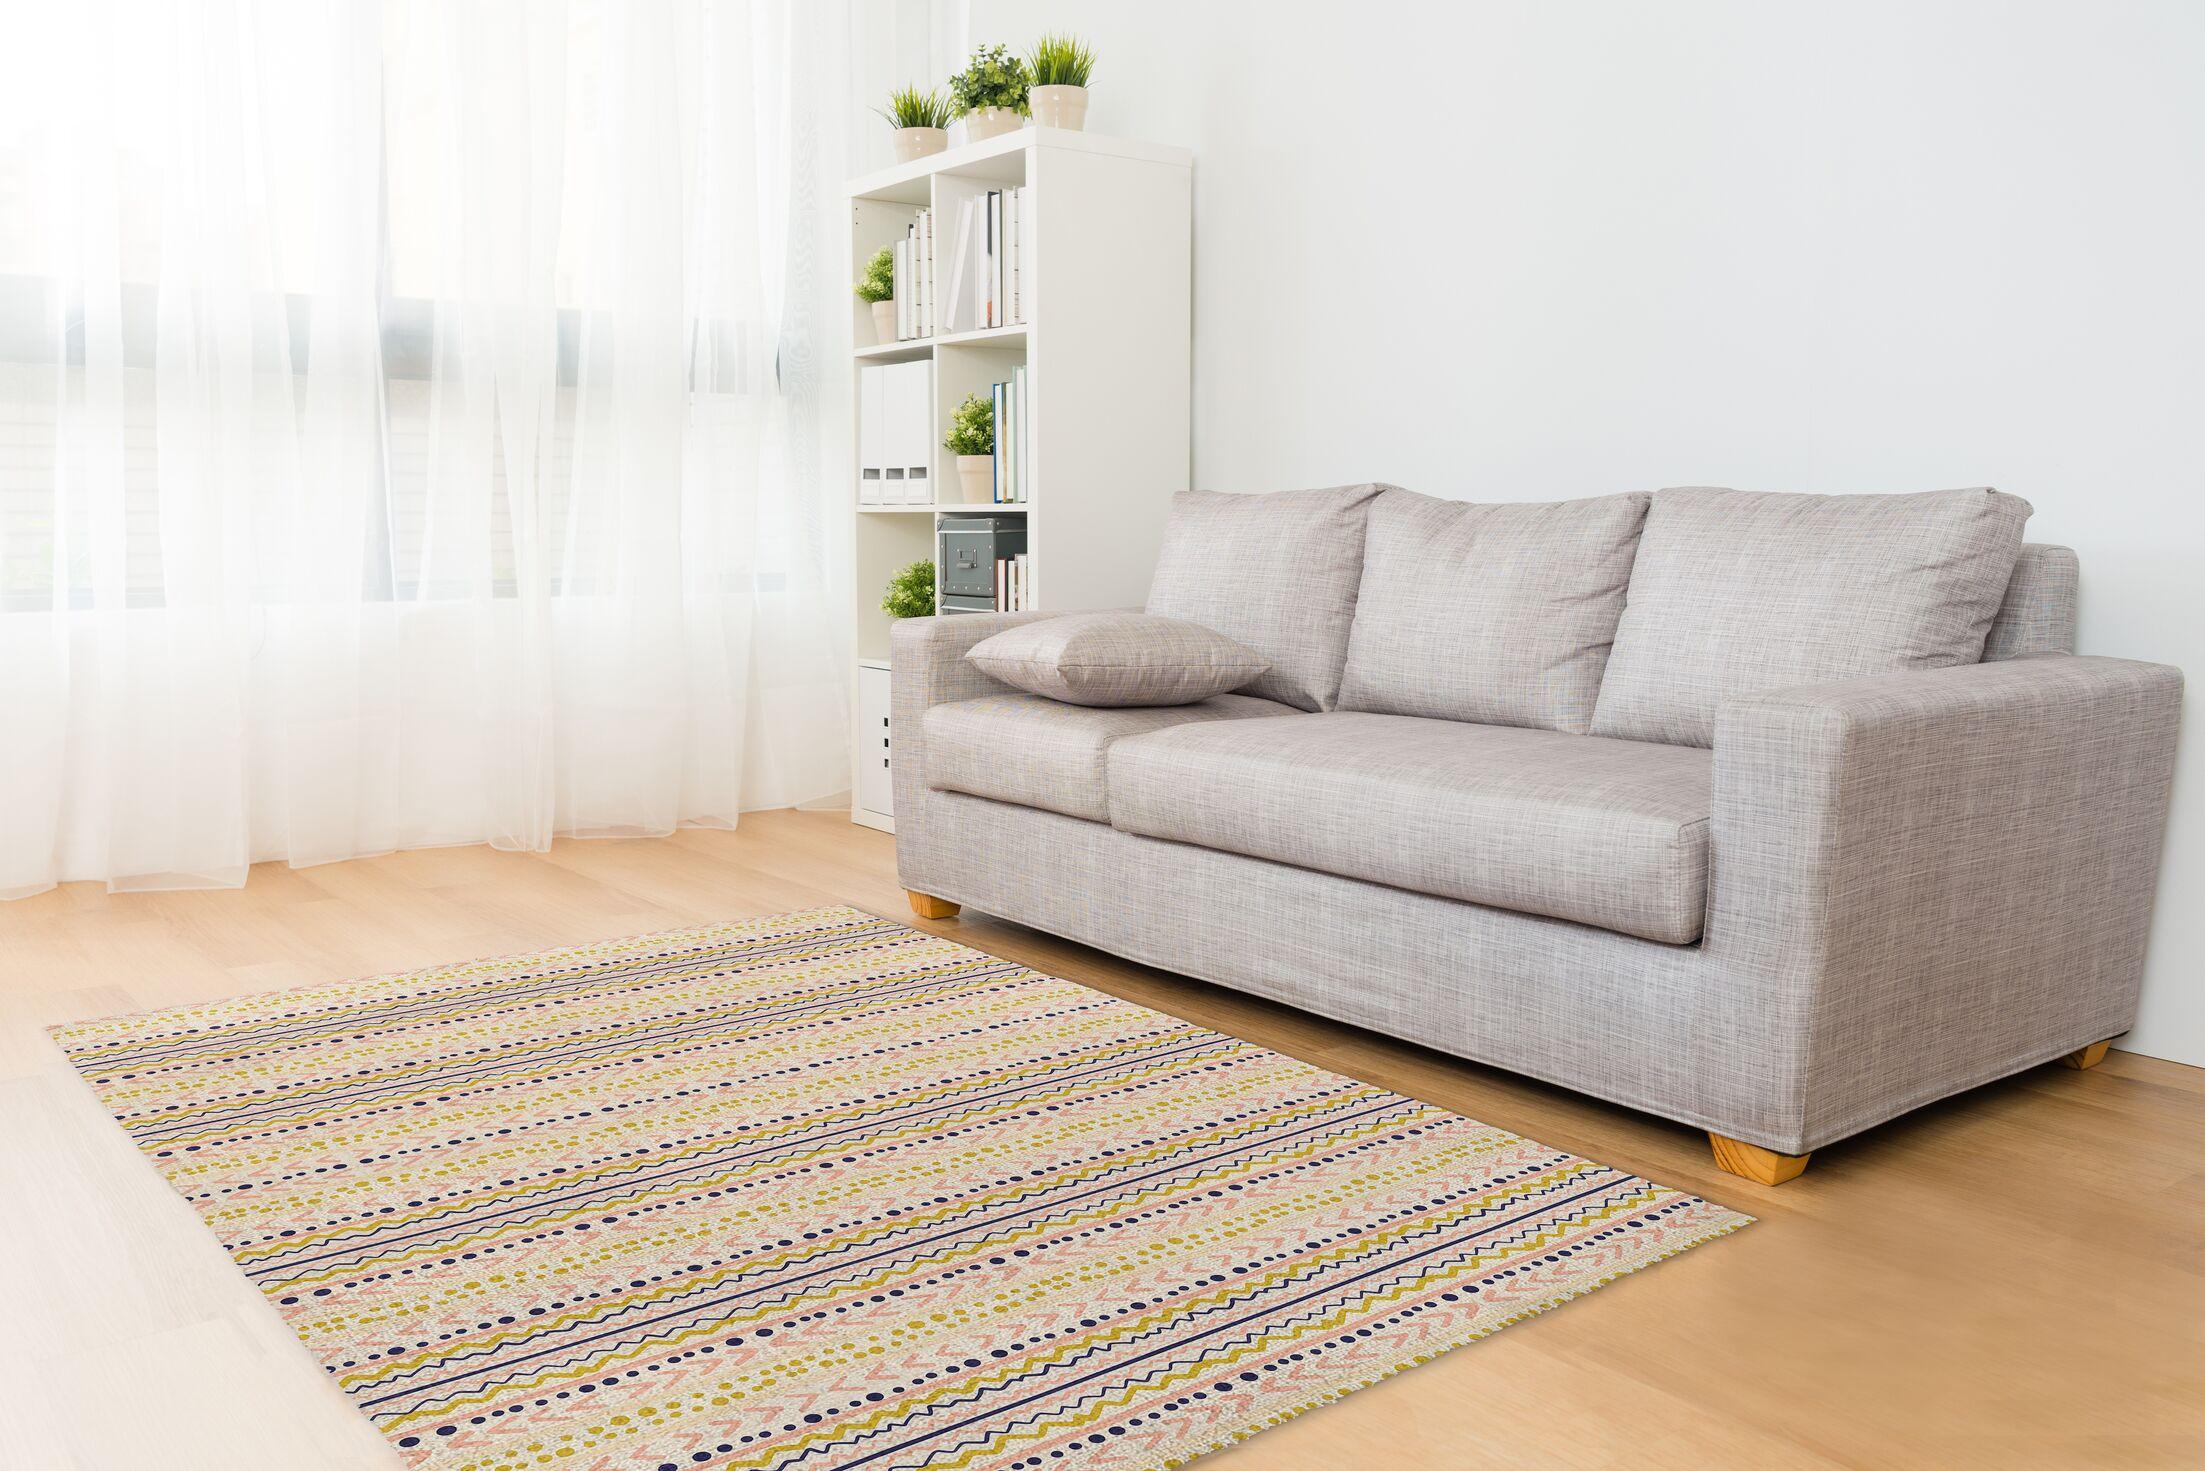 Treyton Pink/Blue Area Rug Rug Size: Rectangle 3' x 5'